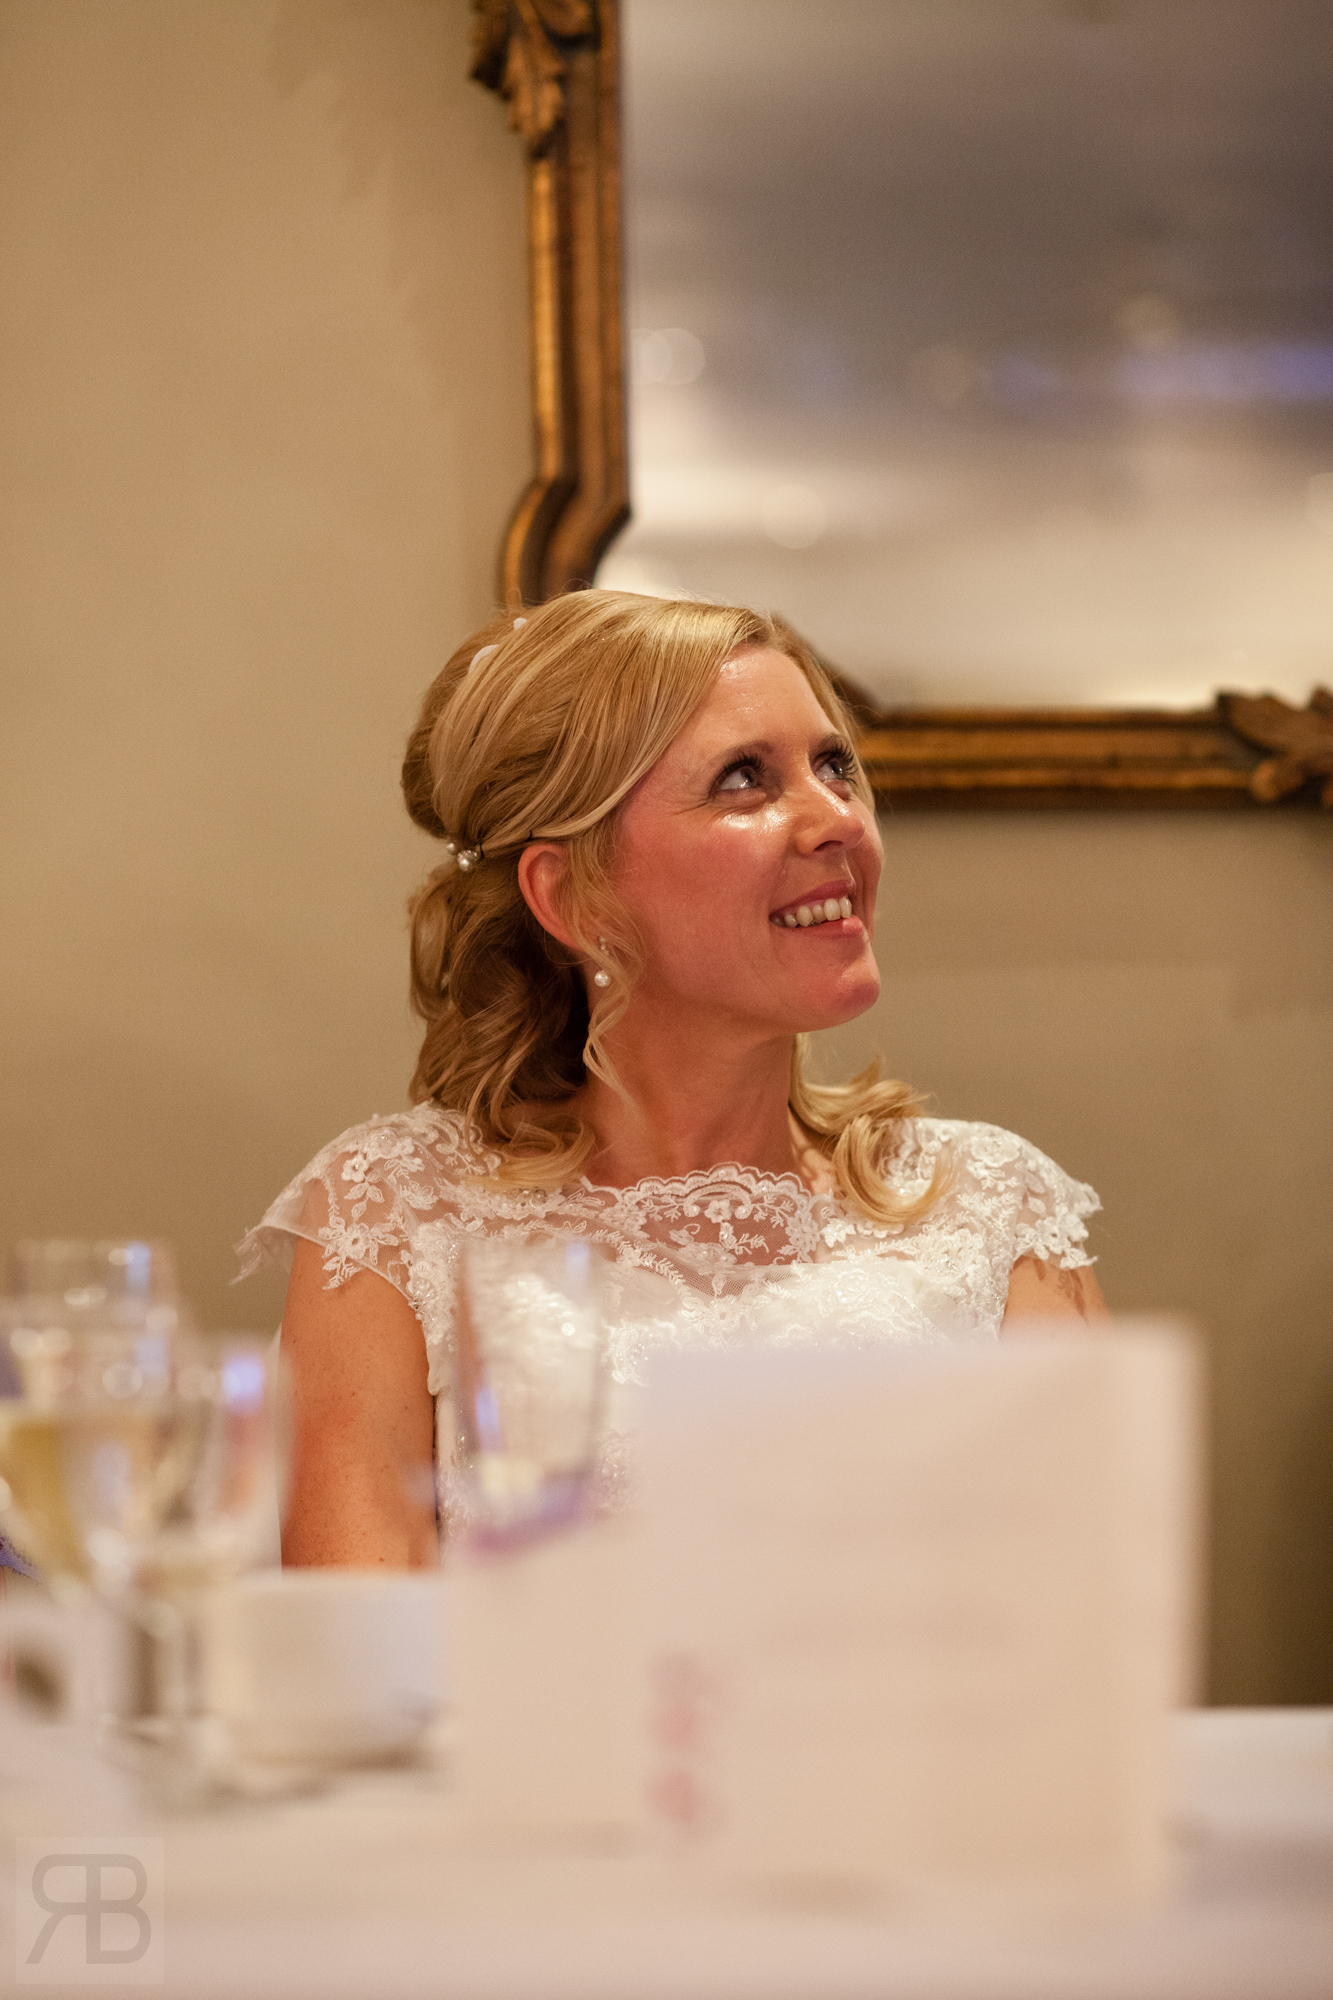 110715_LisaCraigJohnson_Wedding_6026618_WebWM.jpg